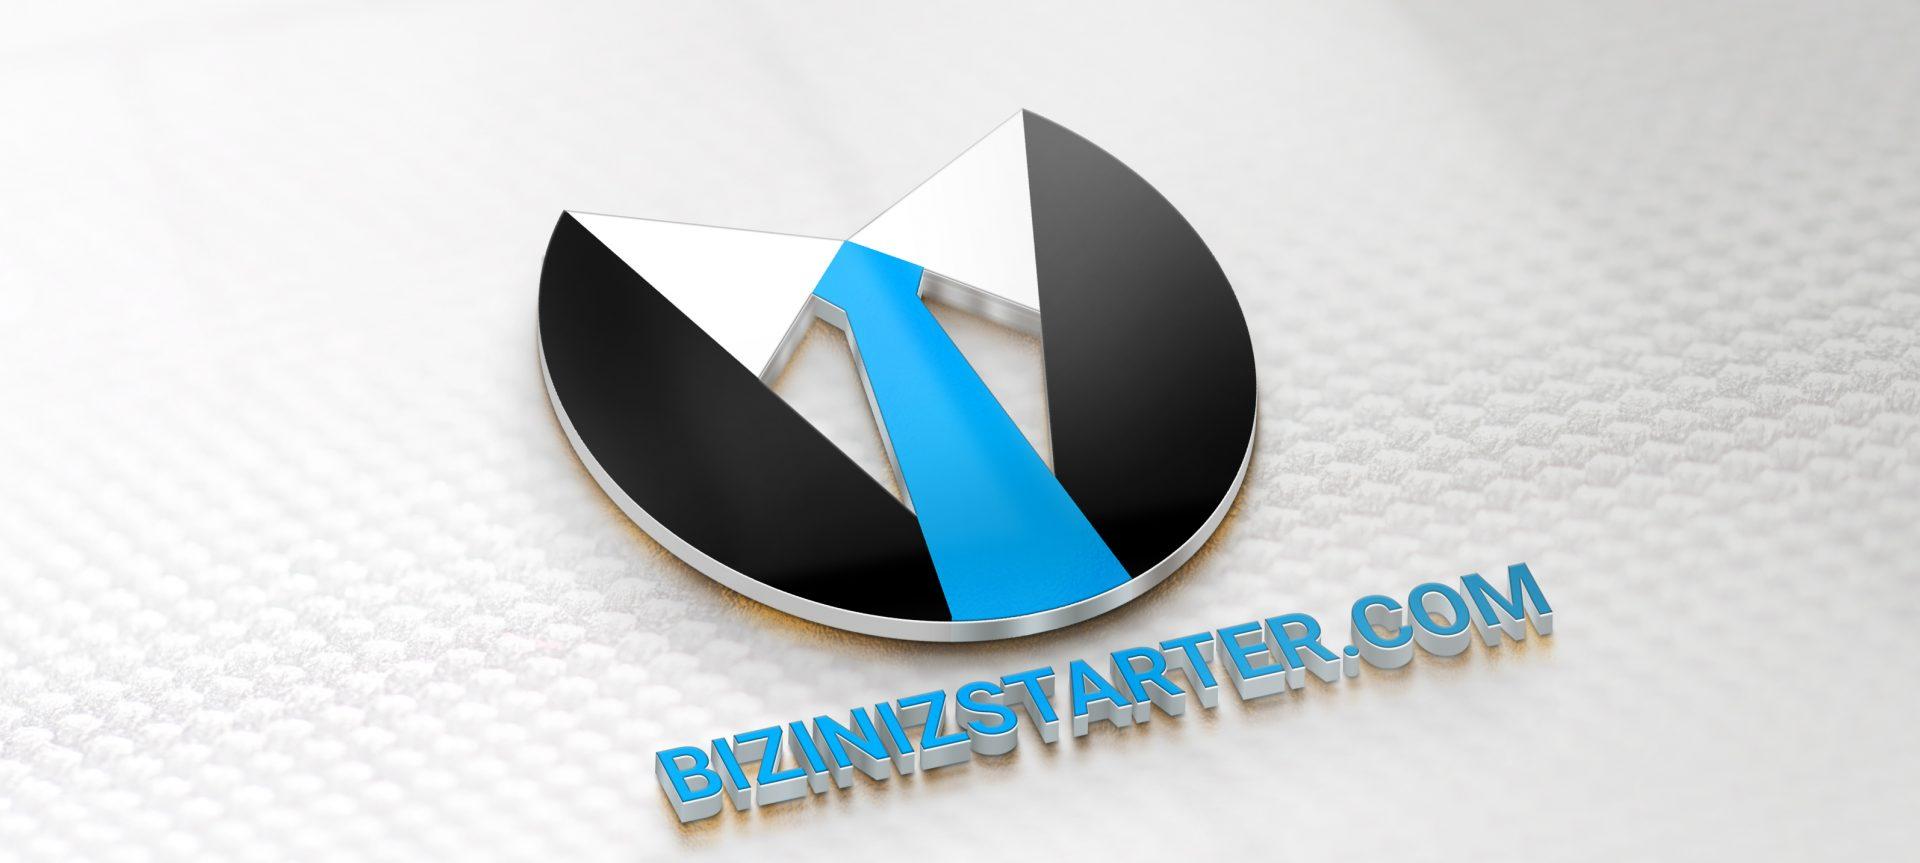 BIZNIZSTARTER.COM